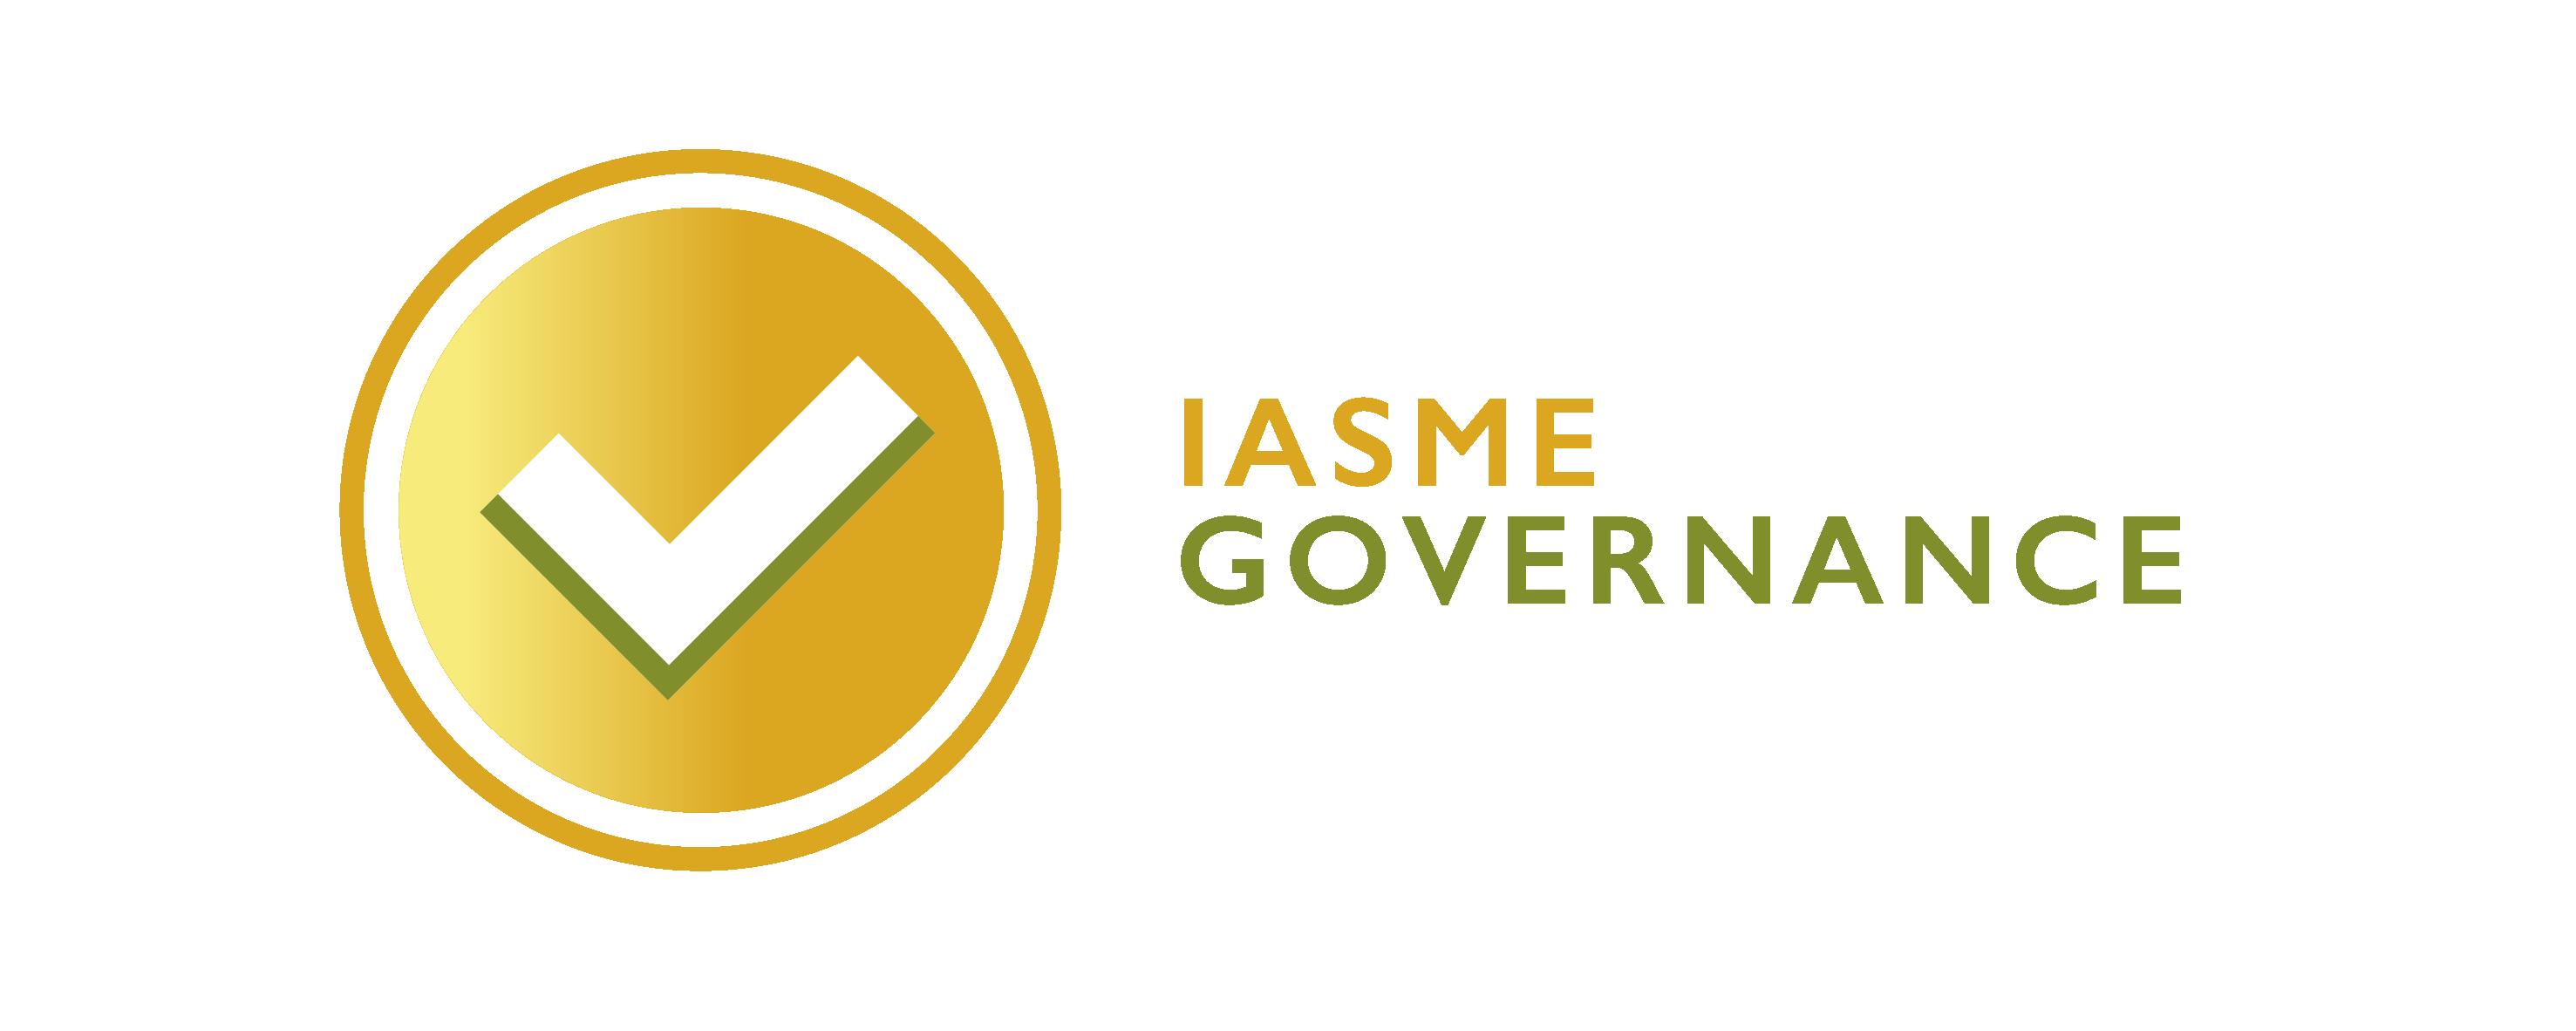 IASME Governance Scheme Logo